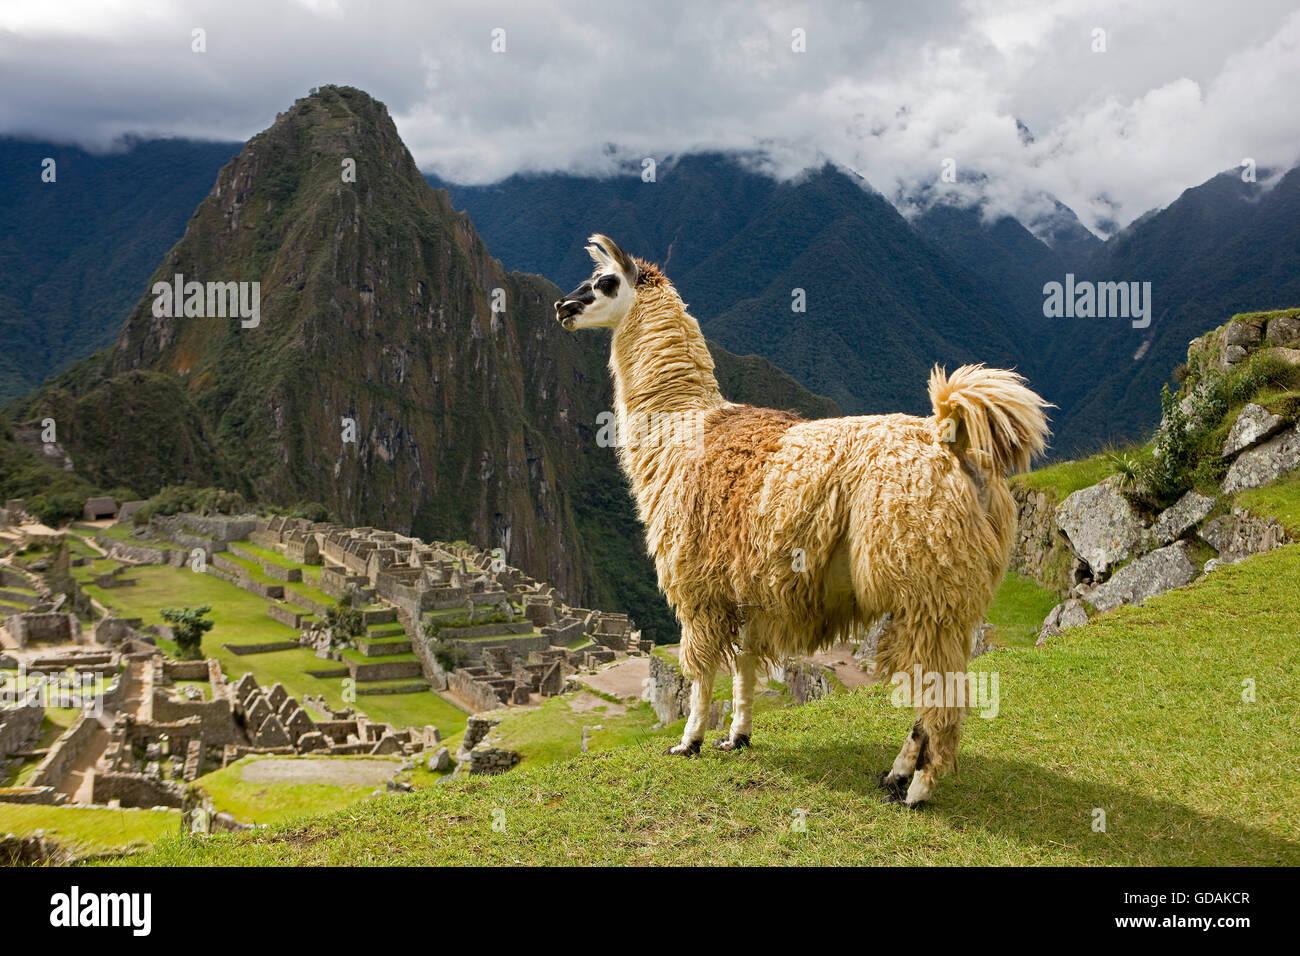 LLAMA lama glama AT MACHU PICCHU, THE LOST CITY OF INCAS, PERU Stock Photo